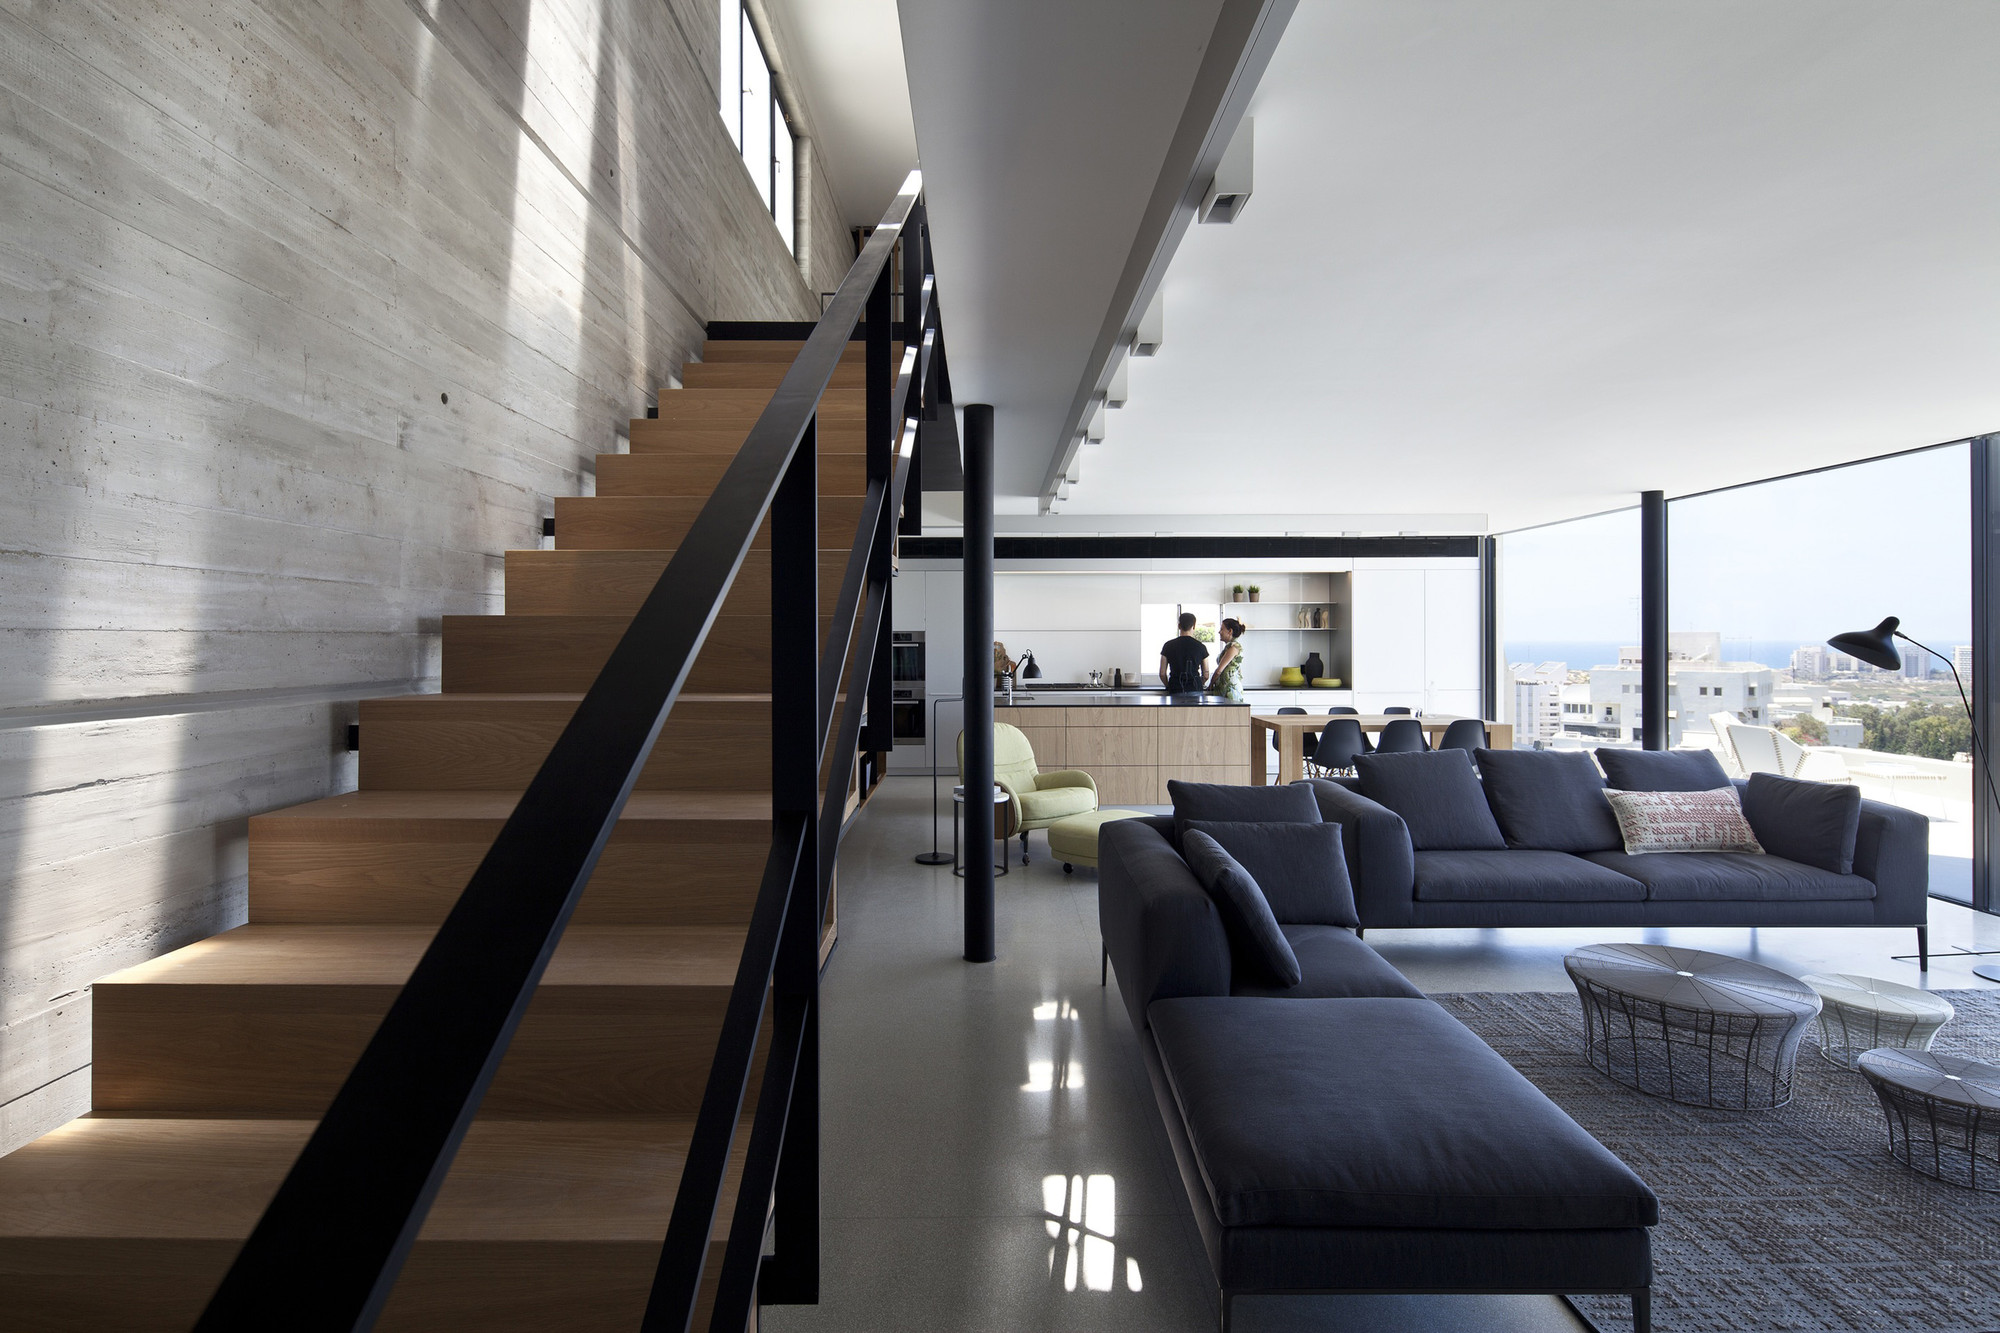 Cobertura Duplex Y / Pitsou Kedem Architects, © Amit Geron